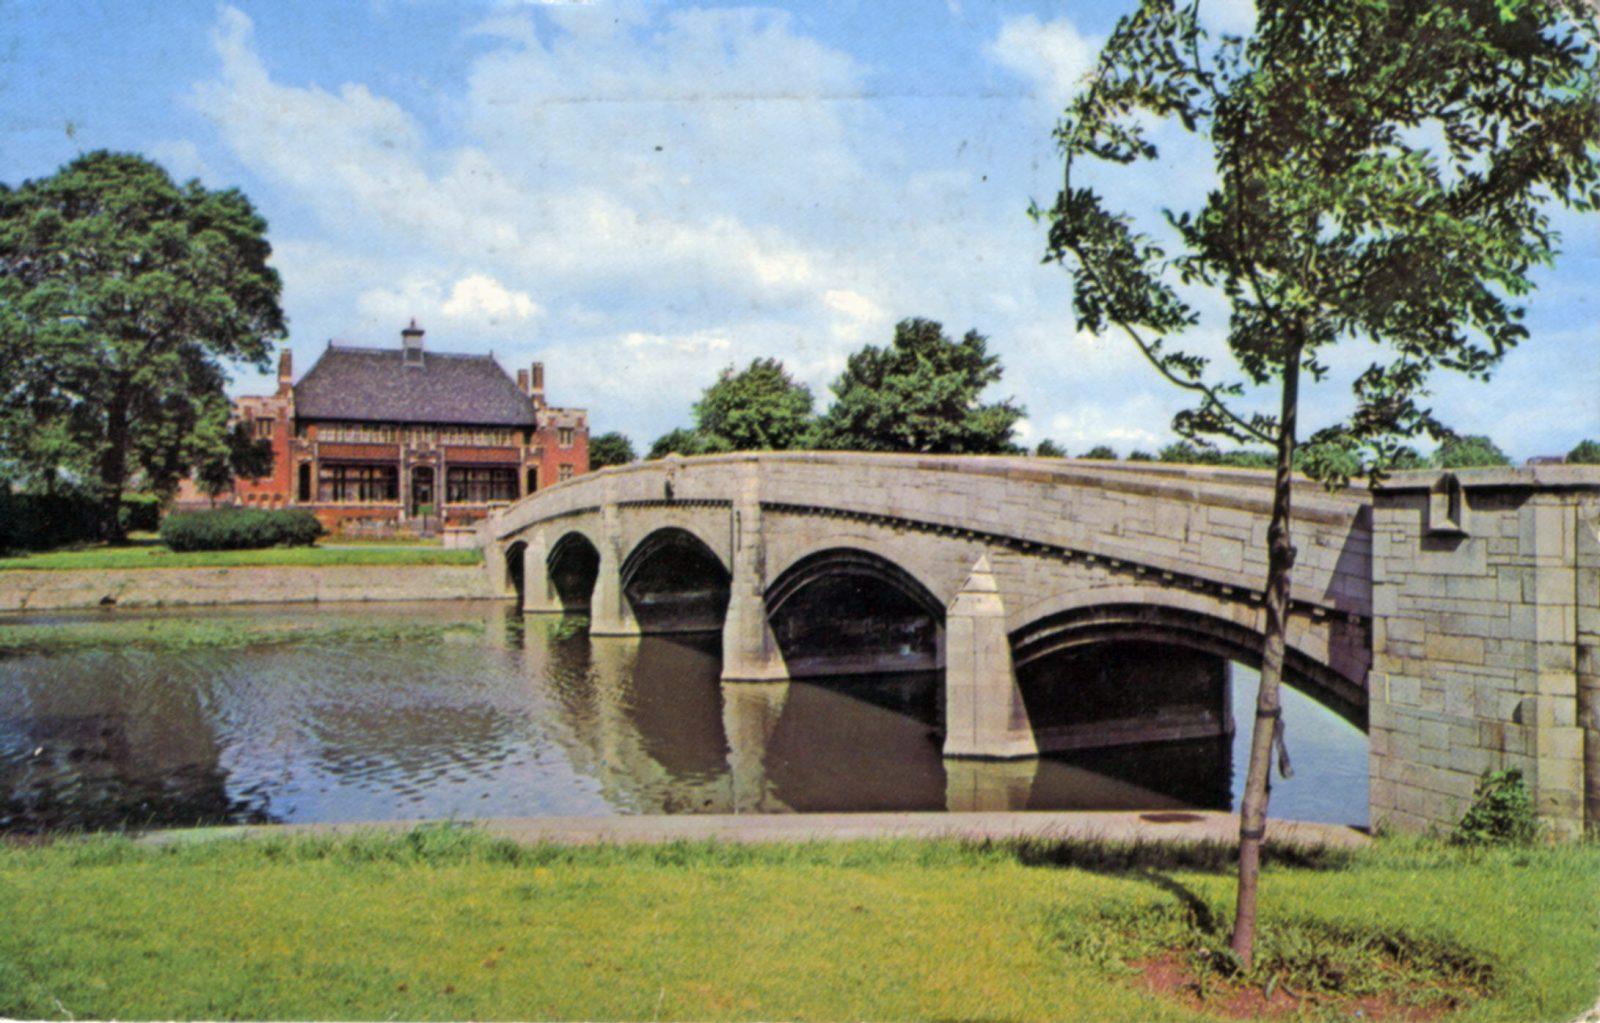 Abbey Park, Leicester. Post 1960: Bridge over River Soar. Pavilion in background. (File:1050)